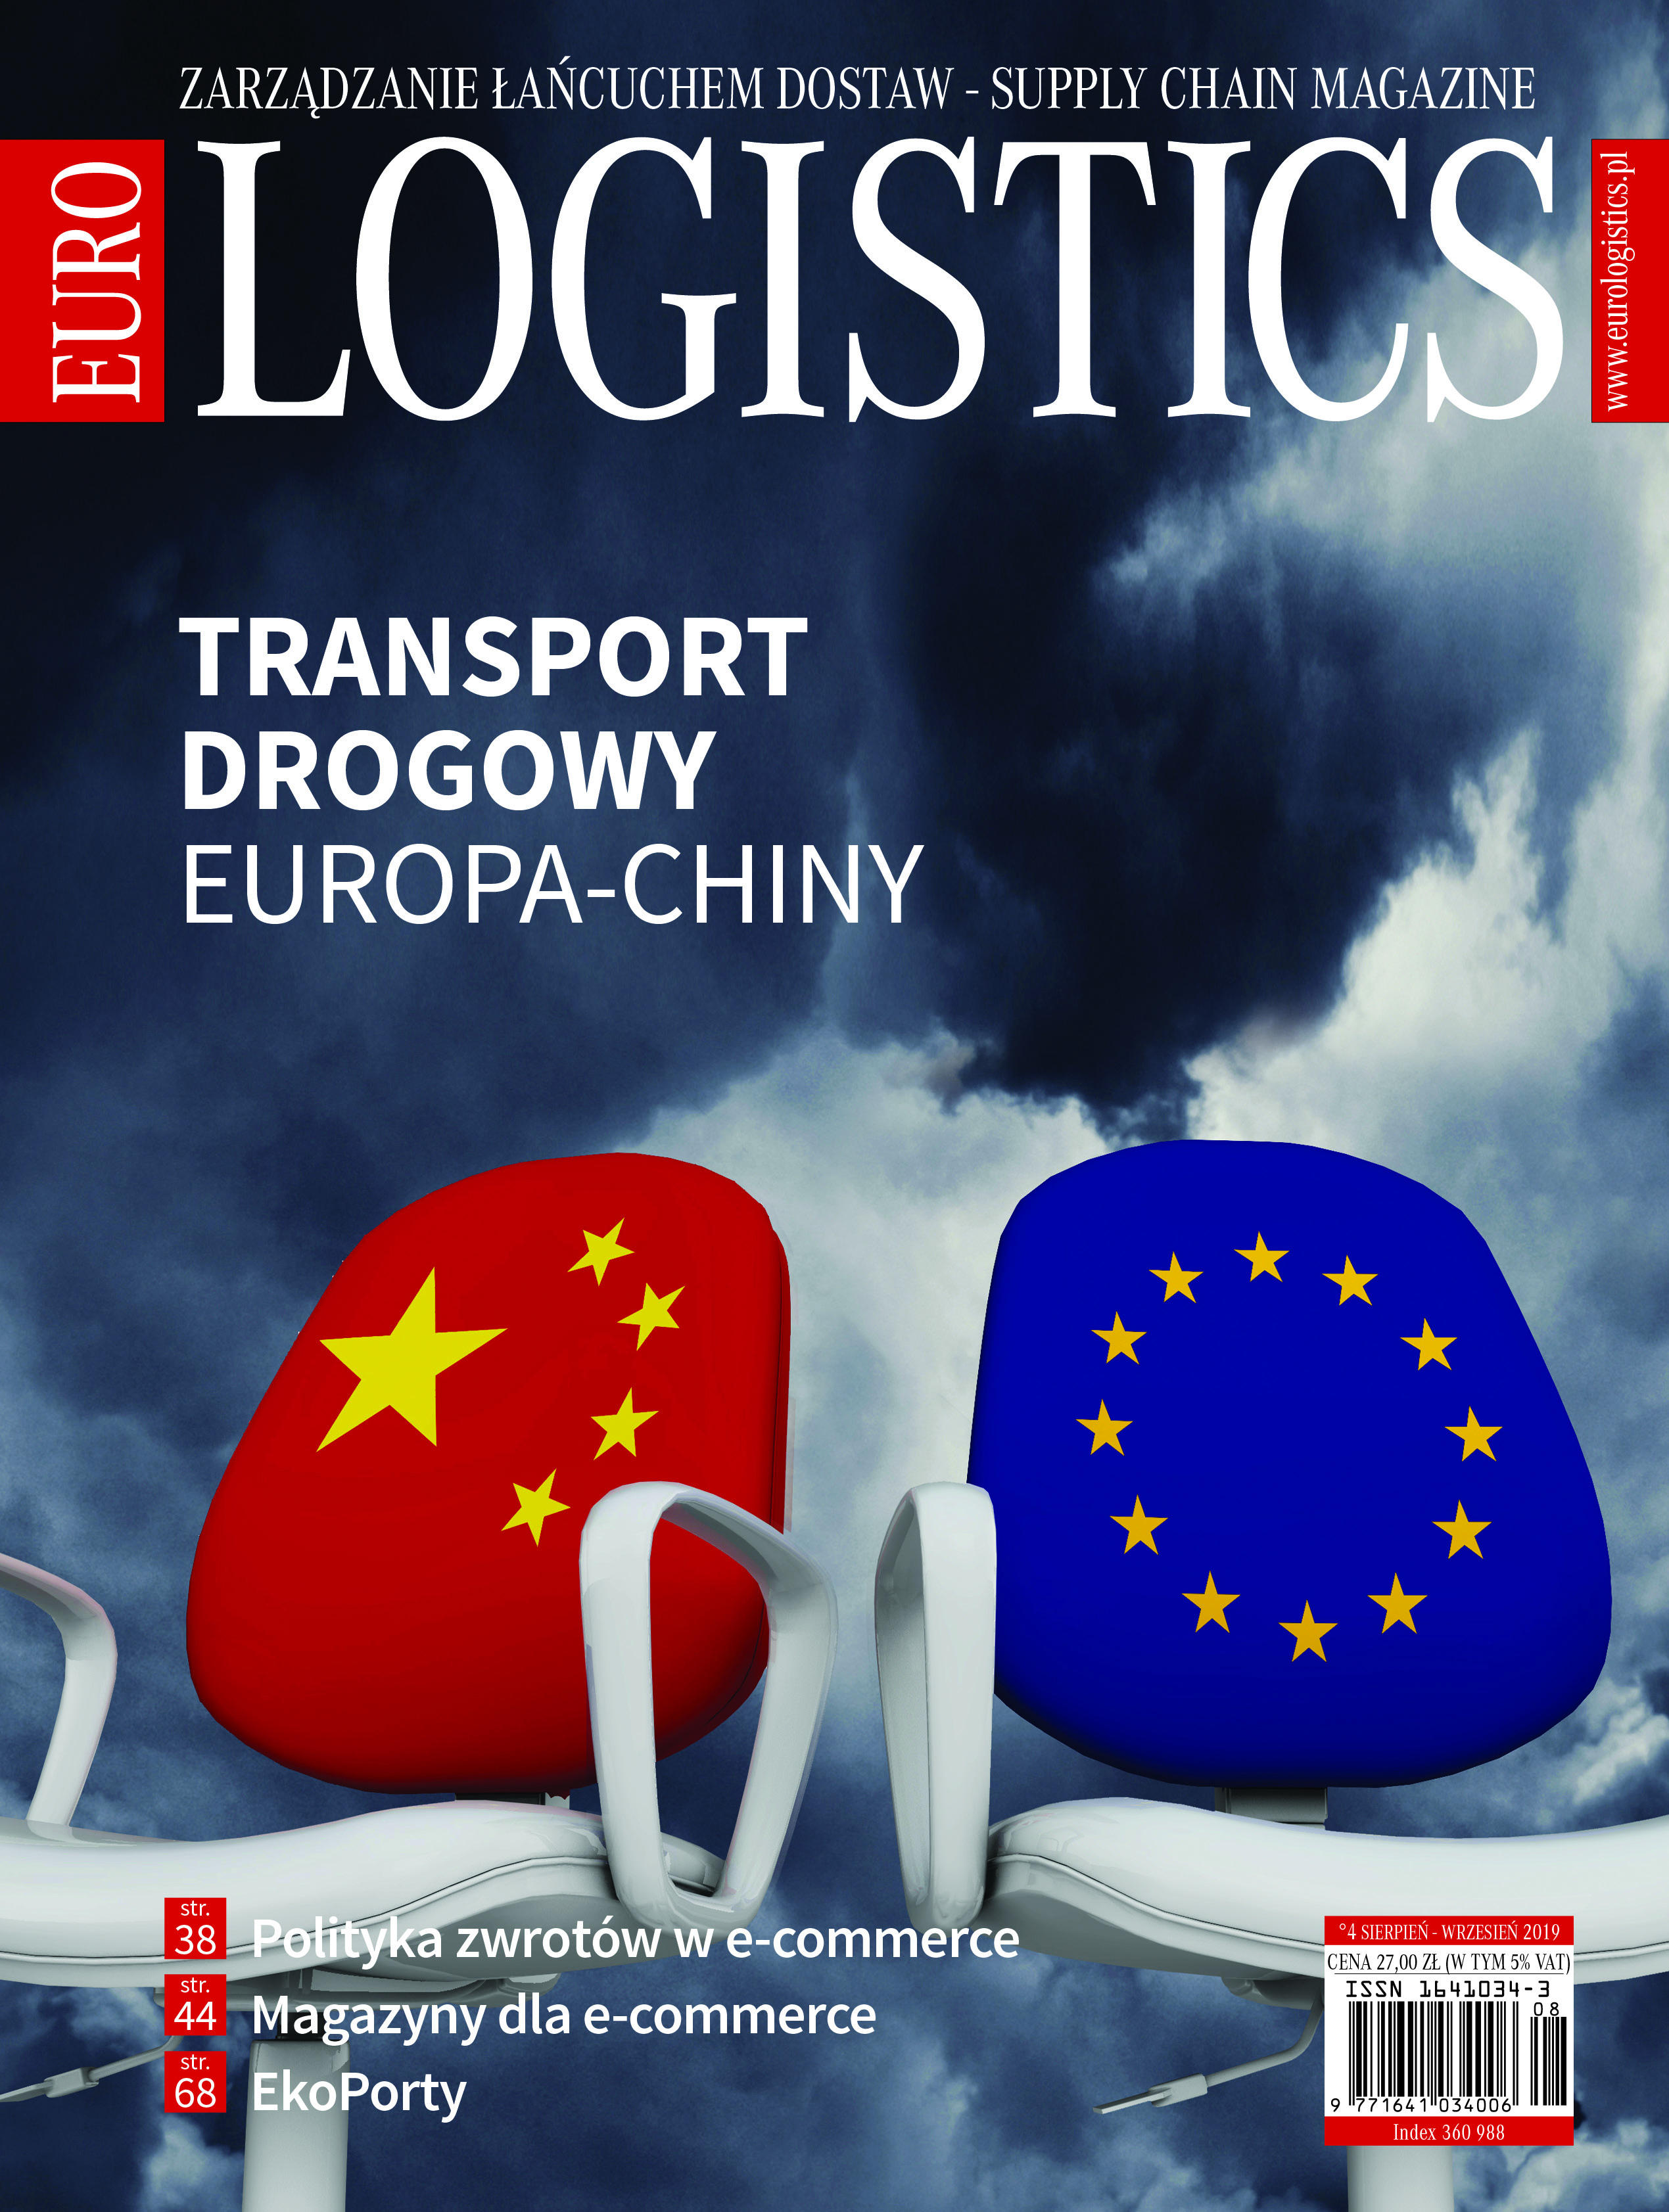 Transport drogowy Europa-Chiny